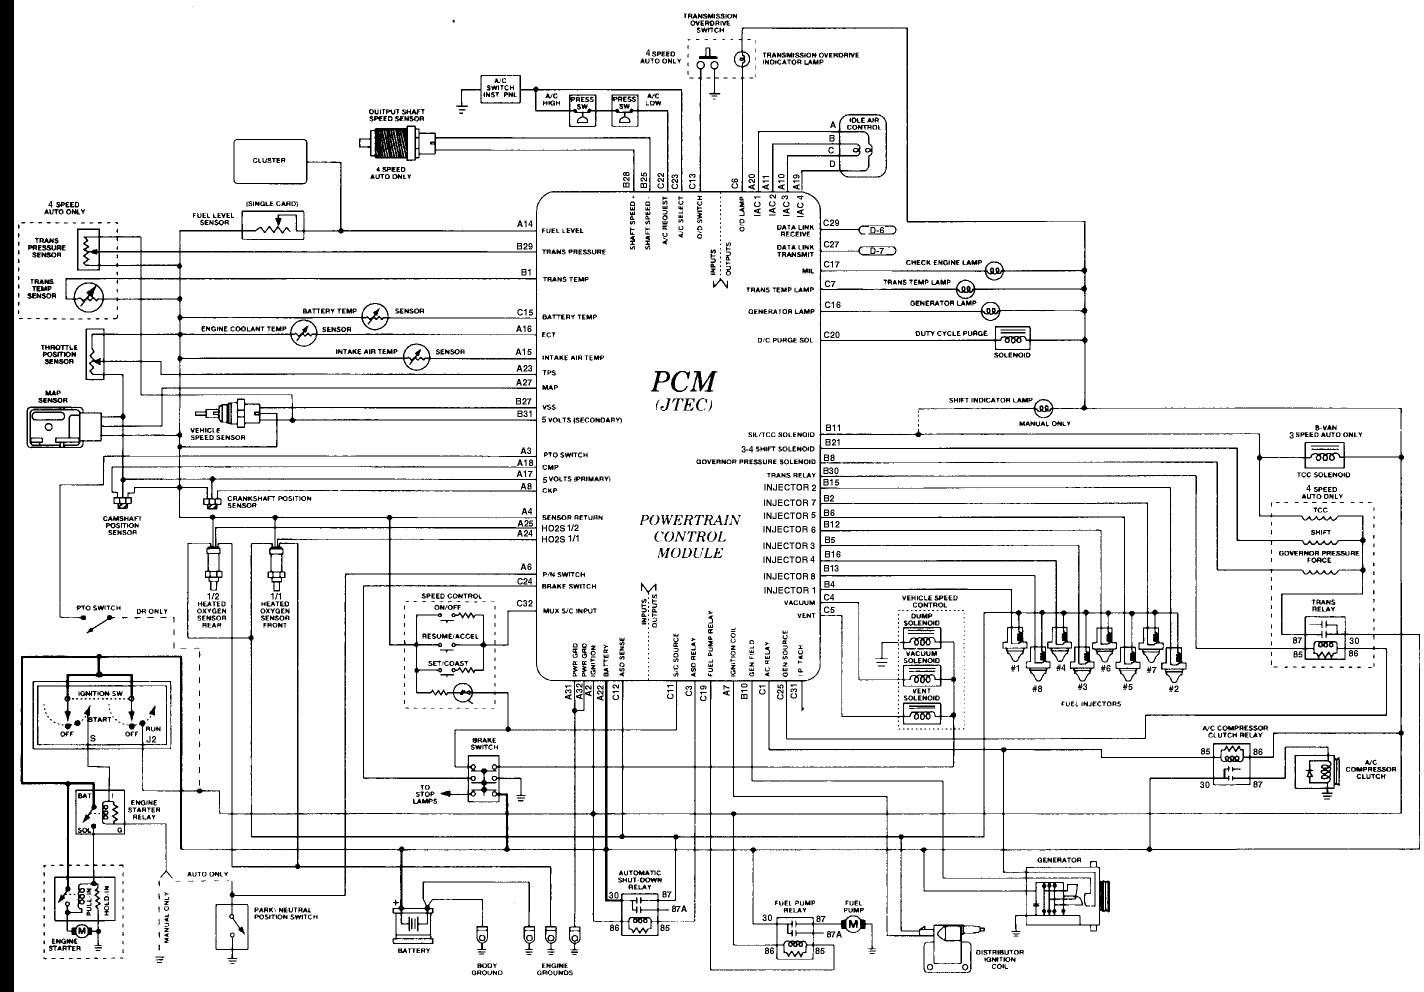 2001 dodge ram 2500 radio wiring diagram Collection-1999 Dodge Durango Radio Wiring Diagram New 8-k